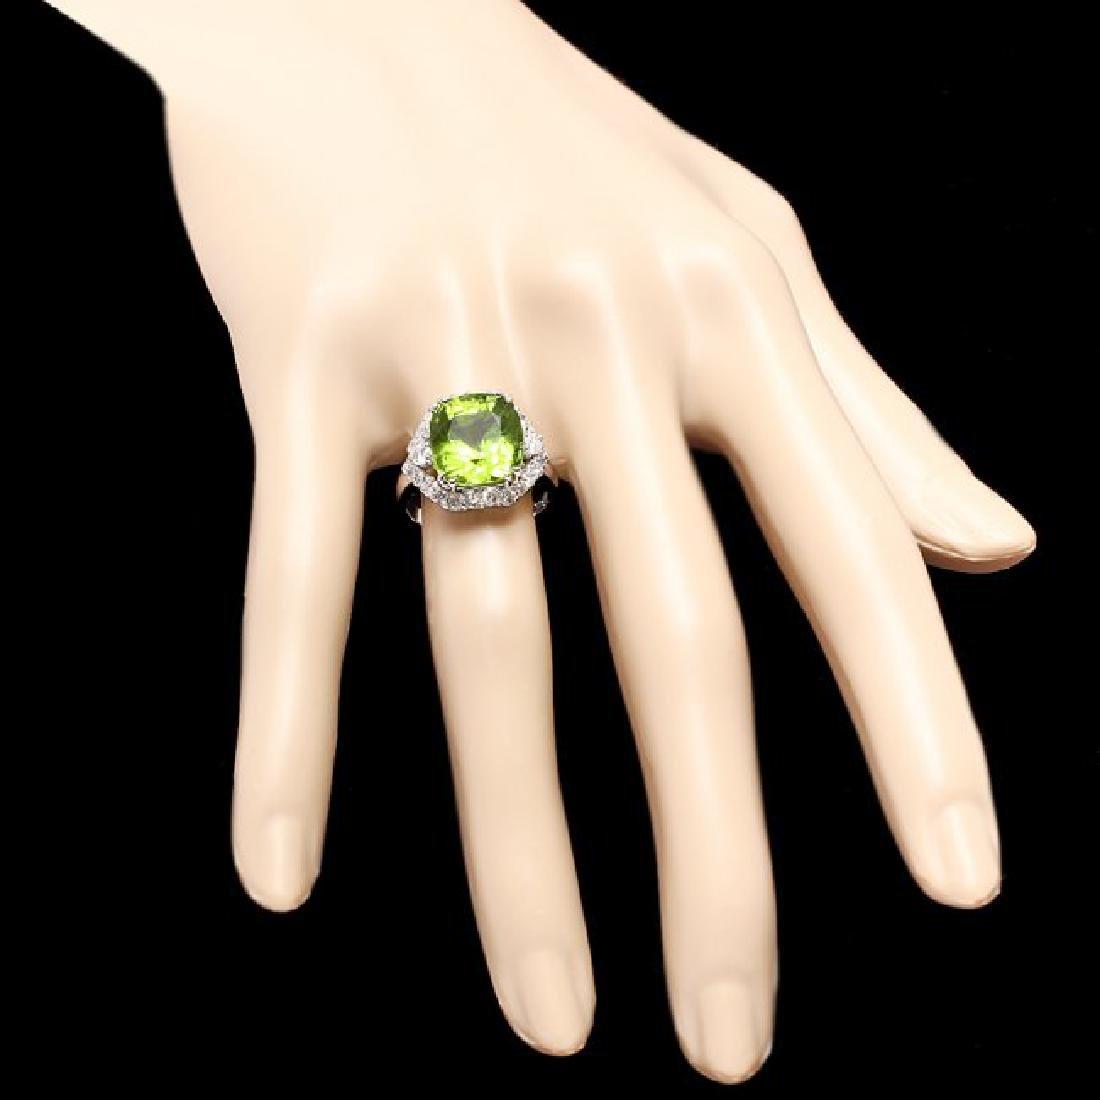 14k White Gold 7.50ct Peridot 1.20ct Diamond Ring - 4